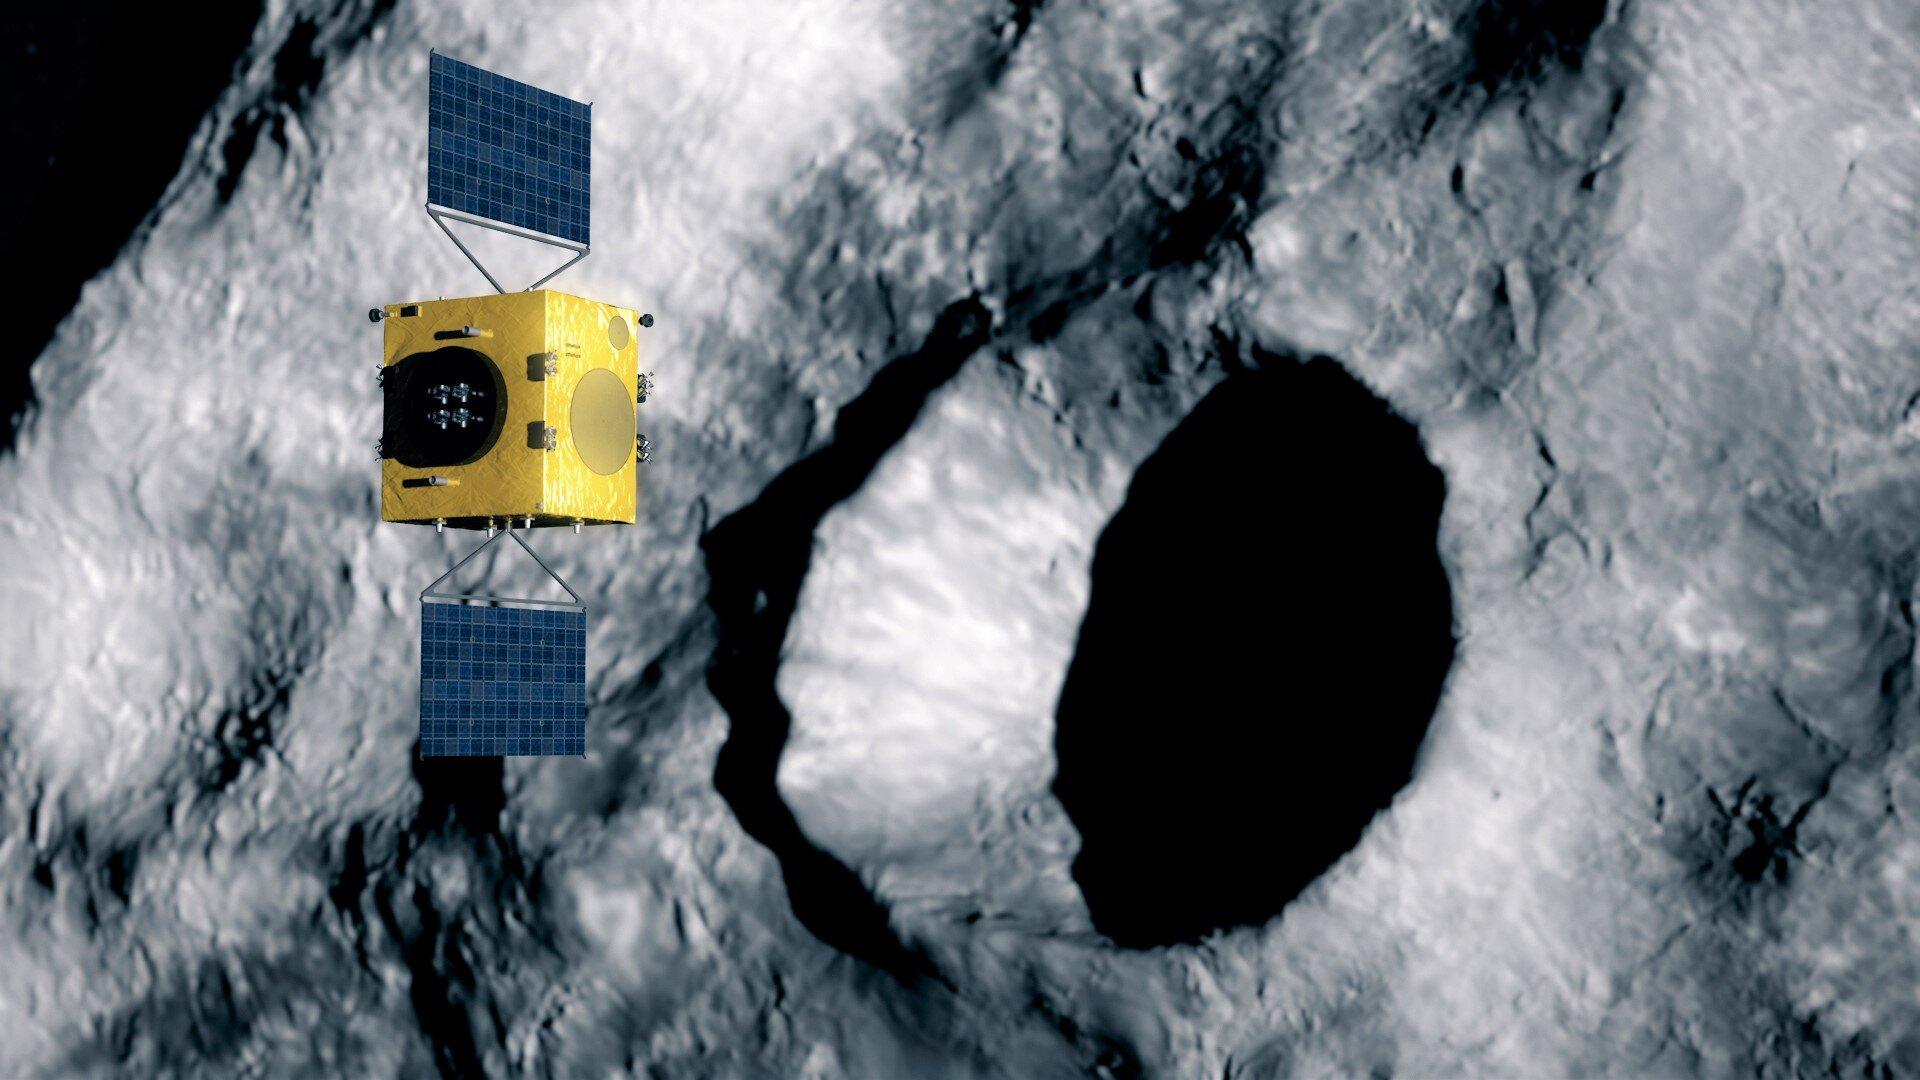 Hera scans DART's impact crater